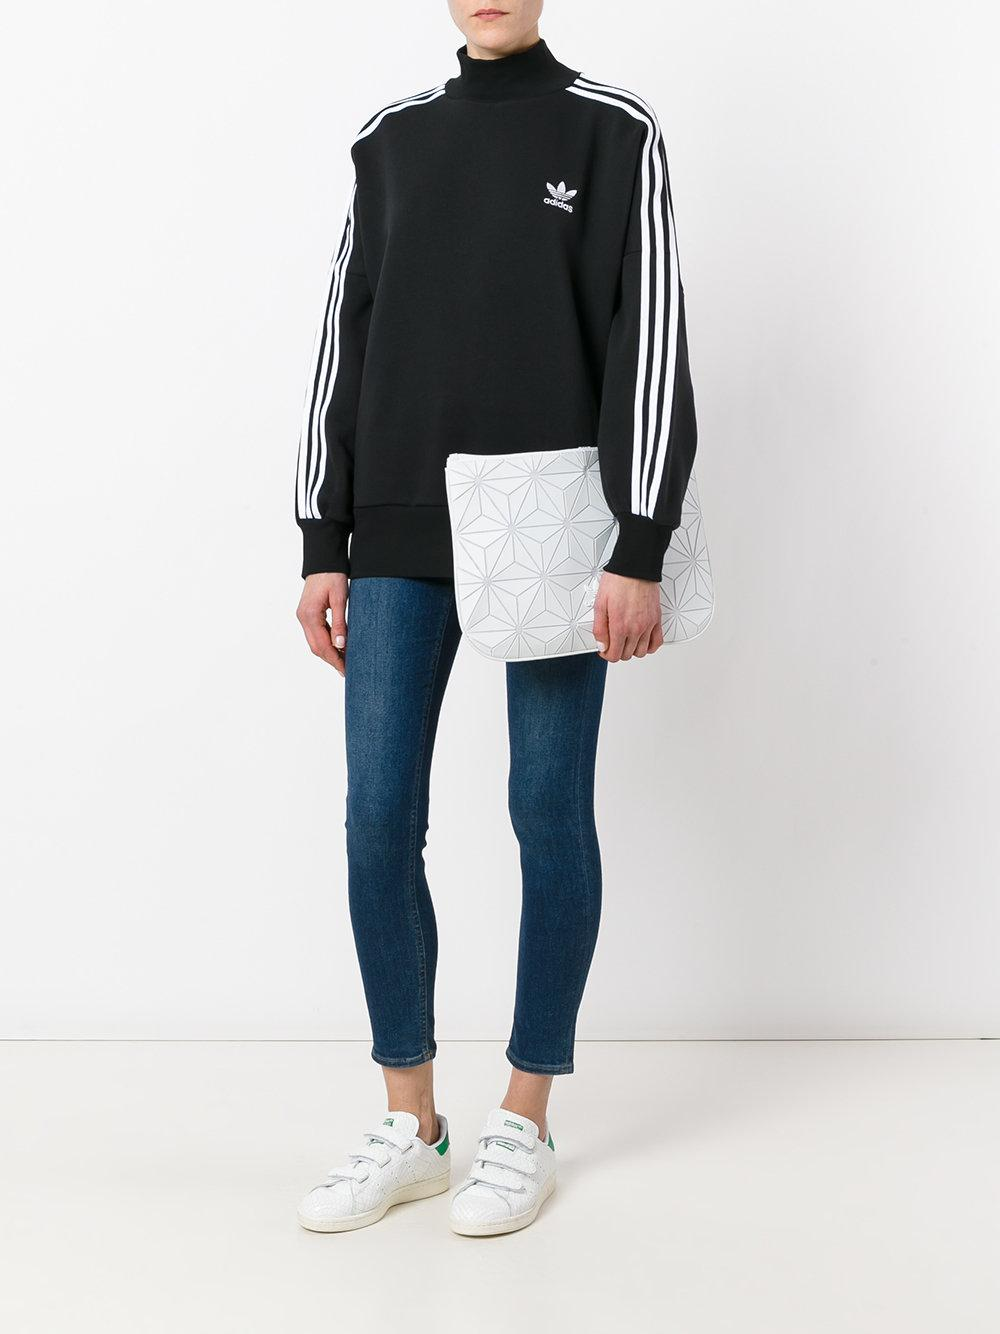 Lyst Adidas Originals Geometric Clutch Bag In White